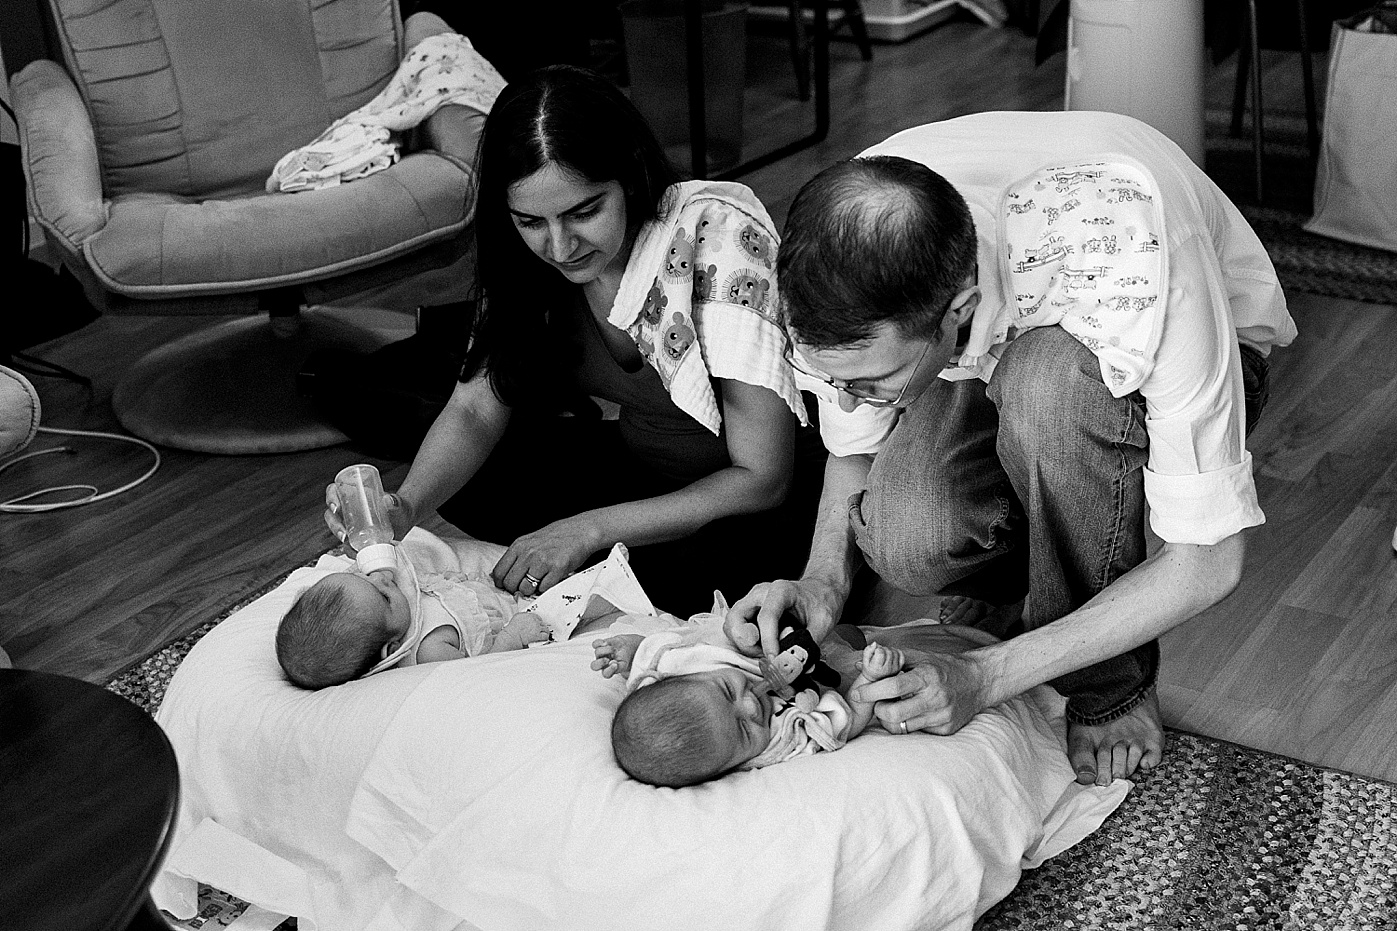 mom and dad feeding twin newborn baby girls documentary candid family photography